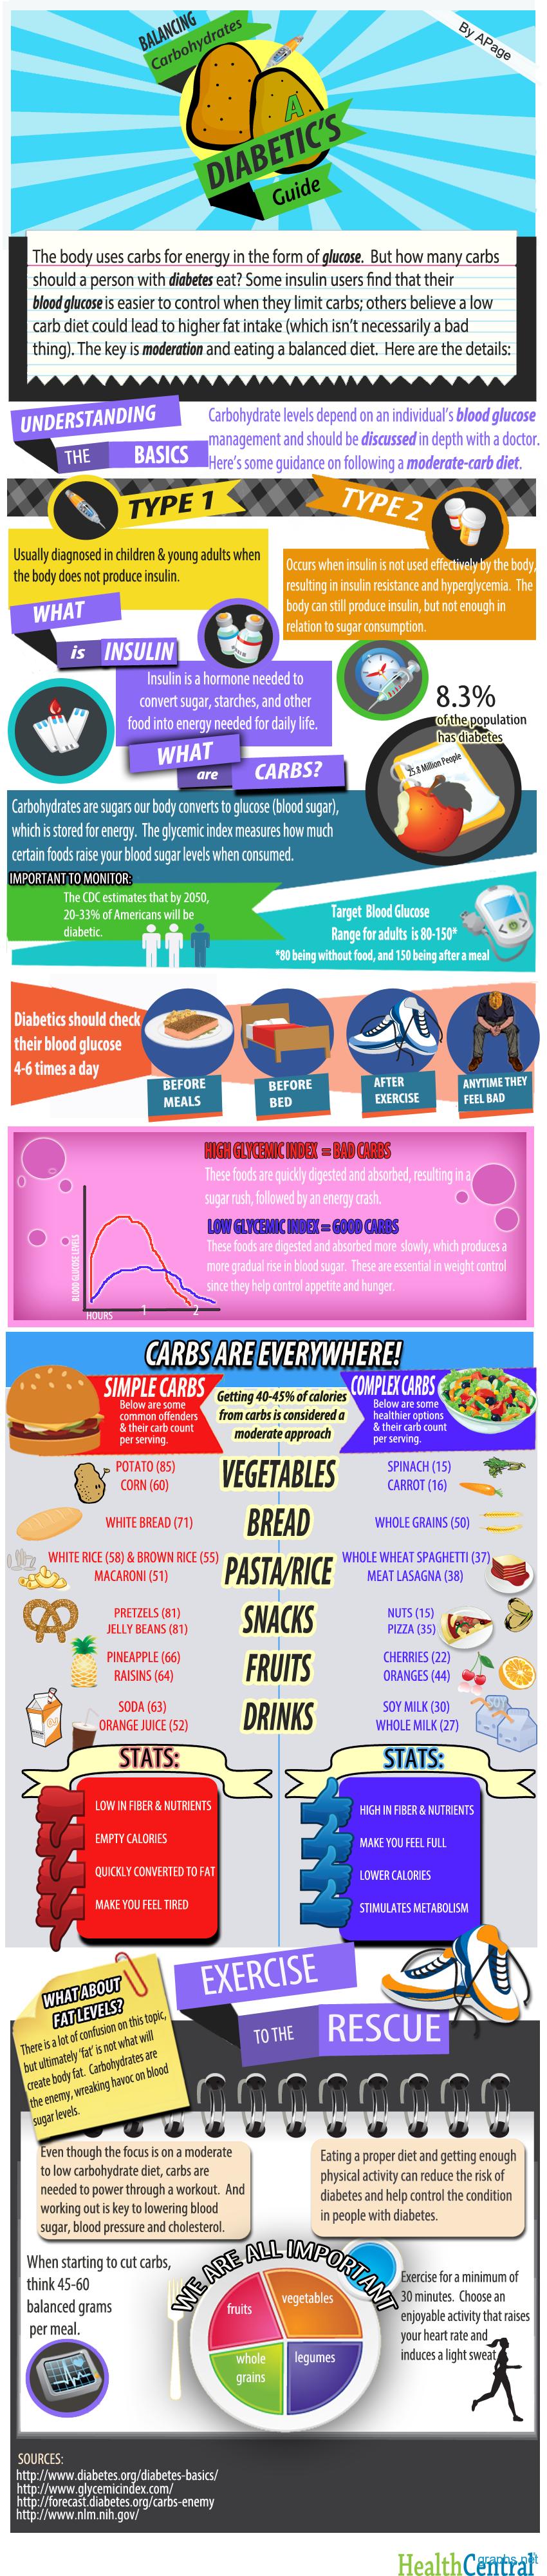 A Diabetic Diet Plan